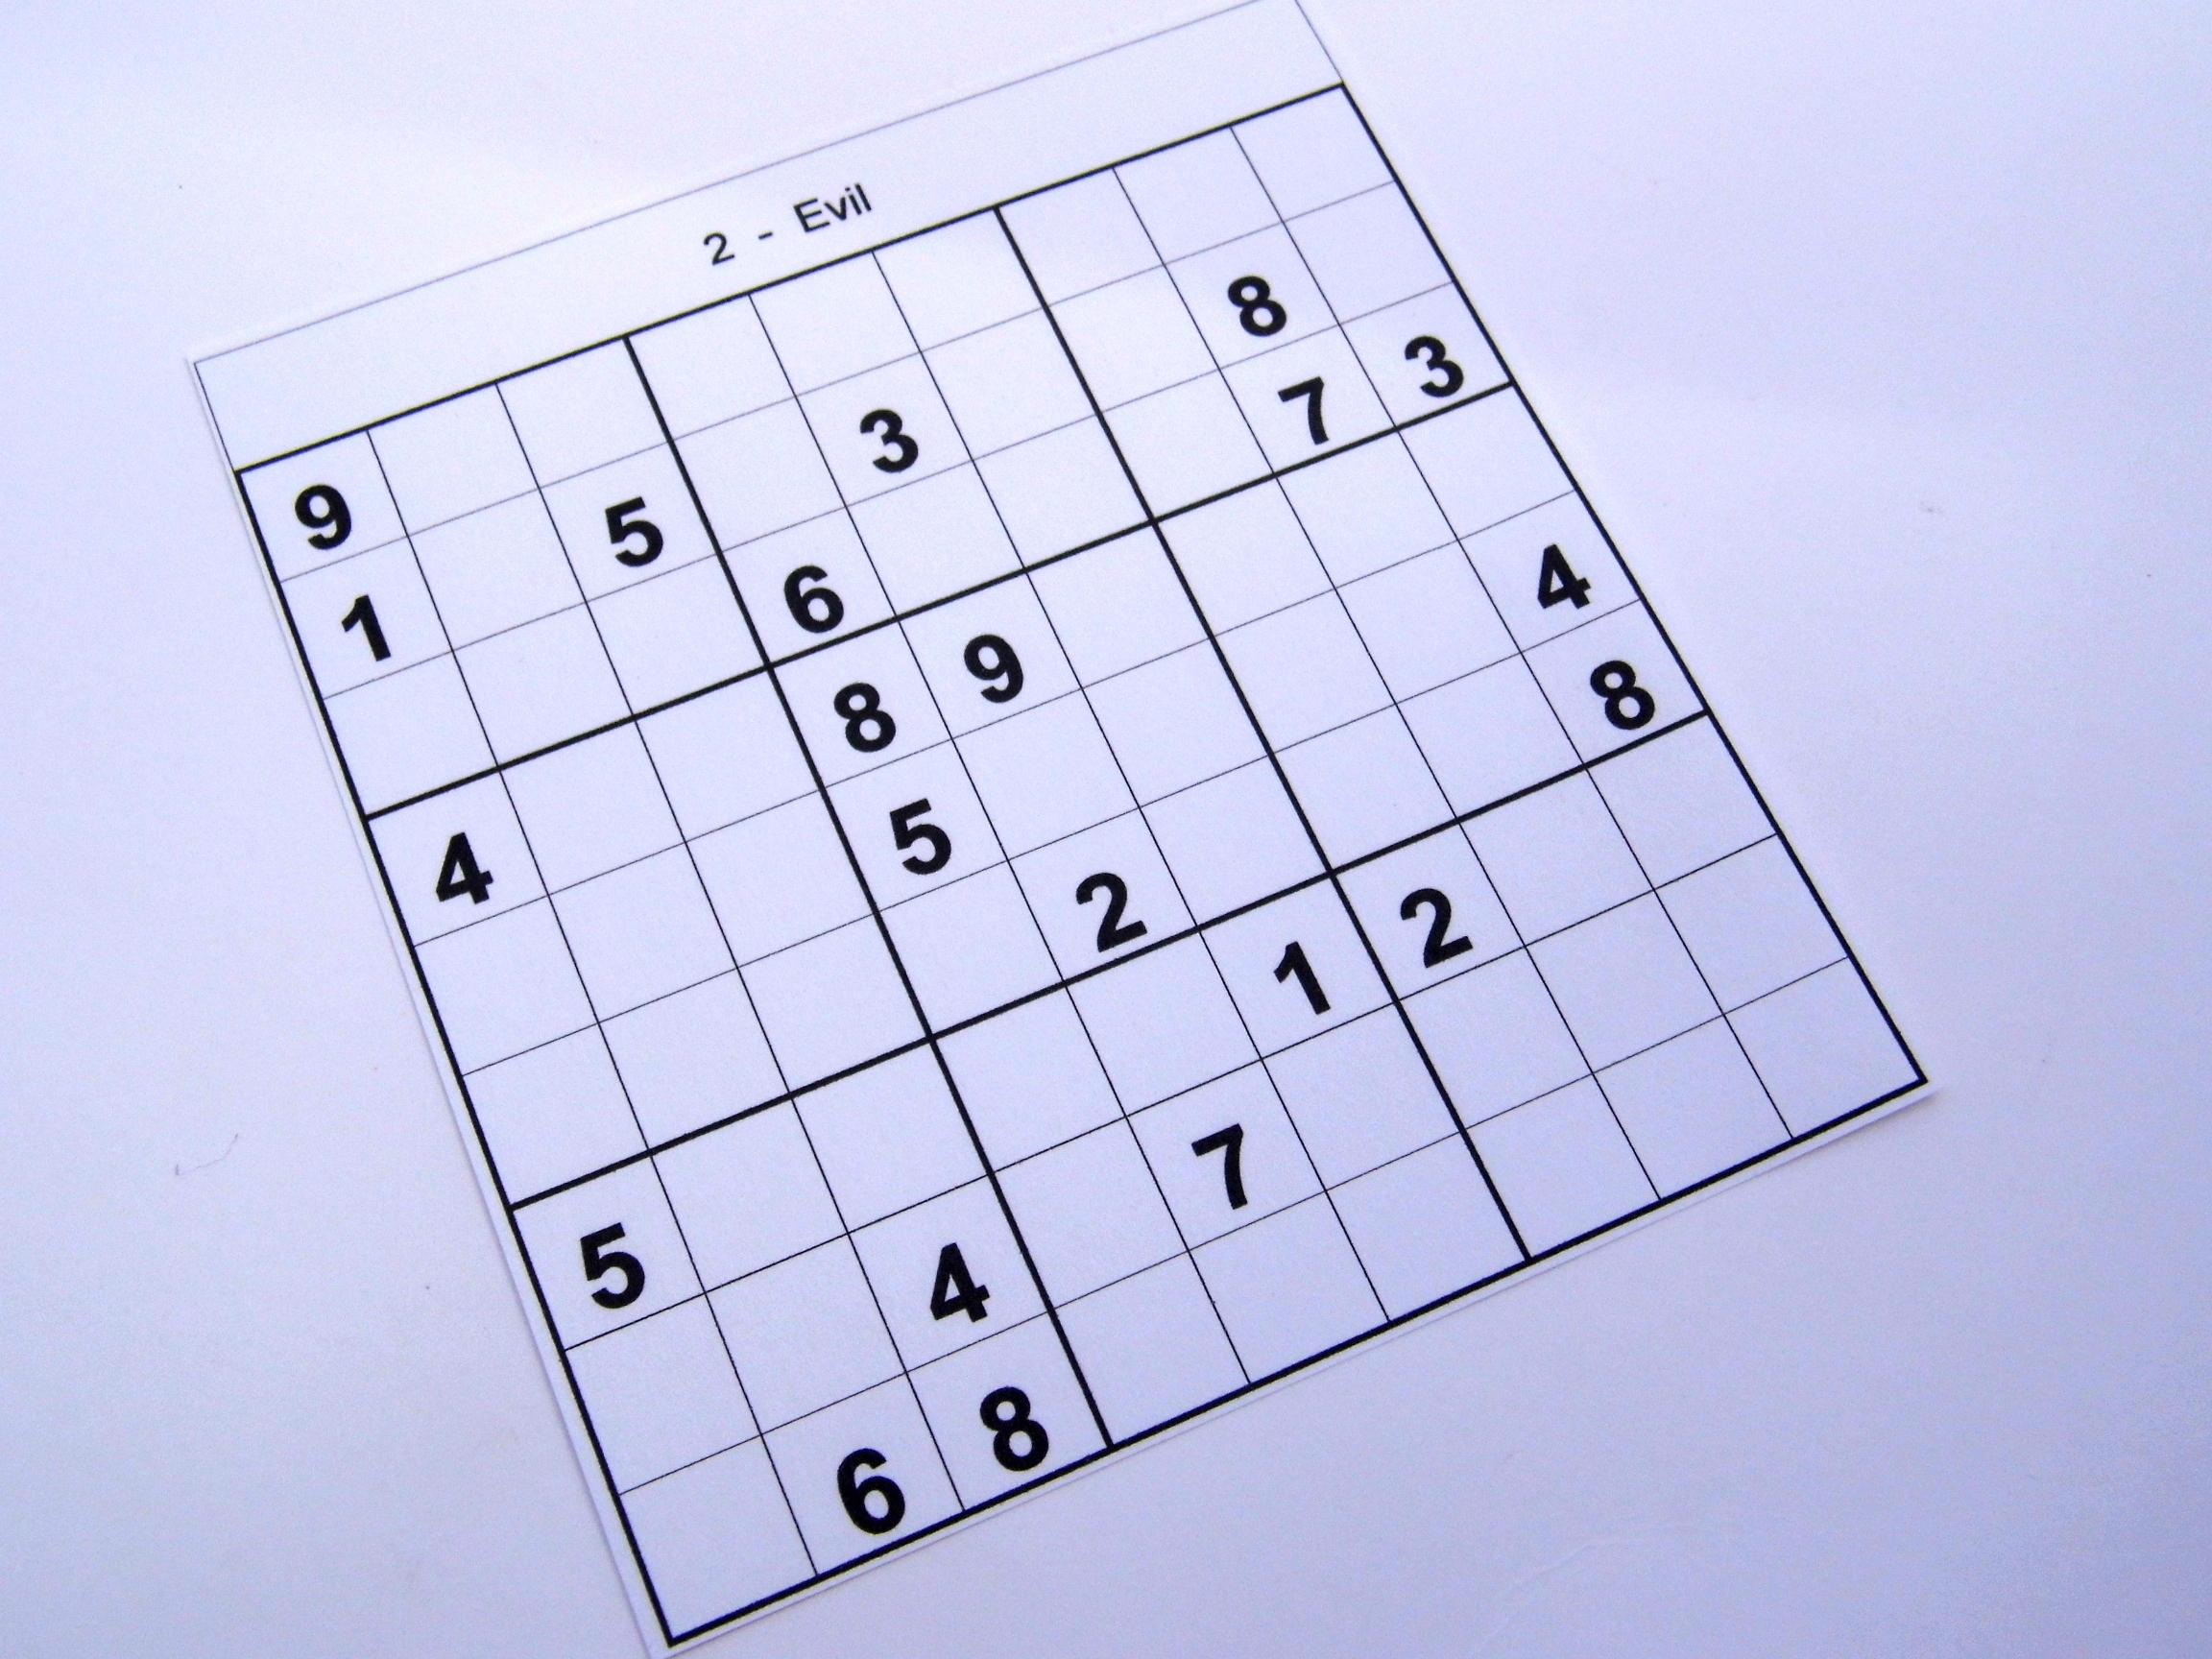 Archive Evil Puzzles – Free Sudoku Puzzles - Free Printable Sudoku 6 - Printable Sudoku Puzzles 8 Per Page